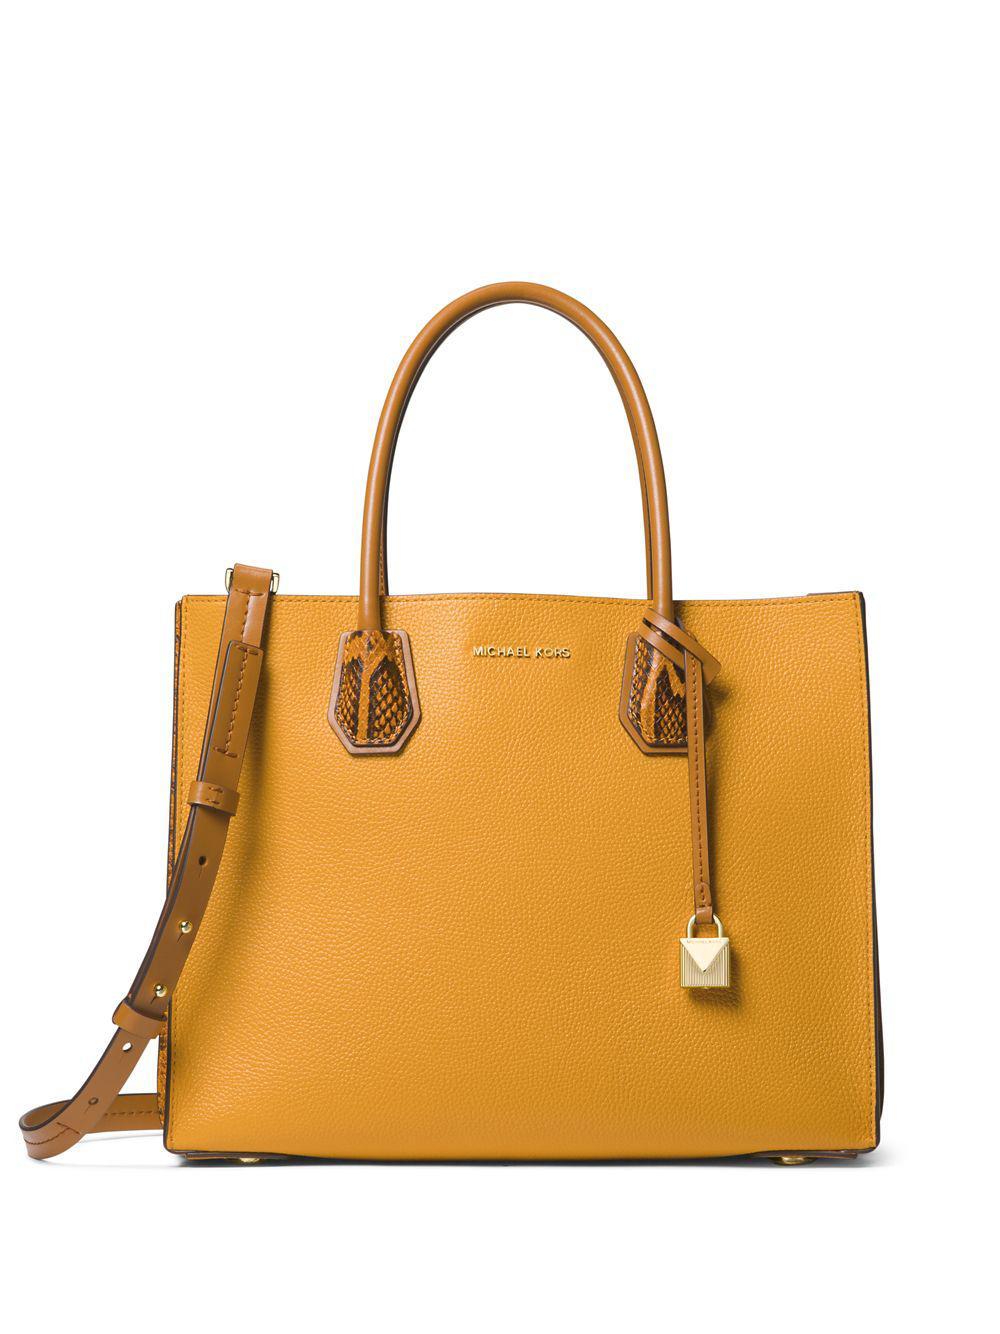 MICHAEL Michael Kors. Women s Yellow Mercer Large Accordion Leather Tote f0cd95081